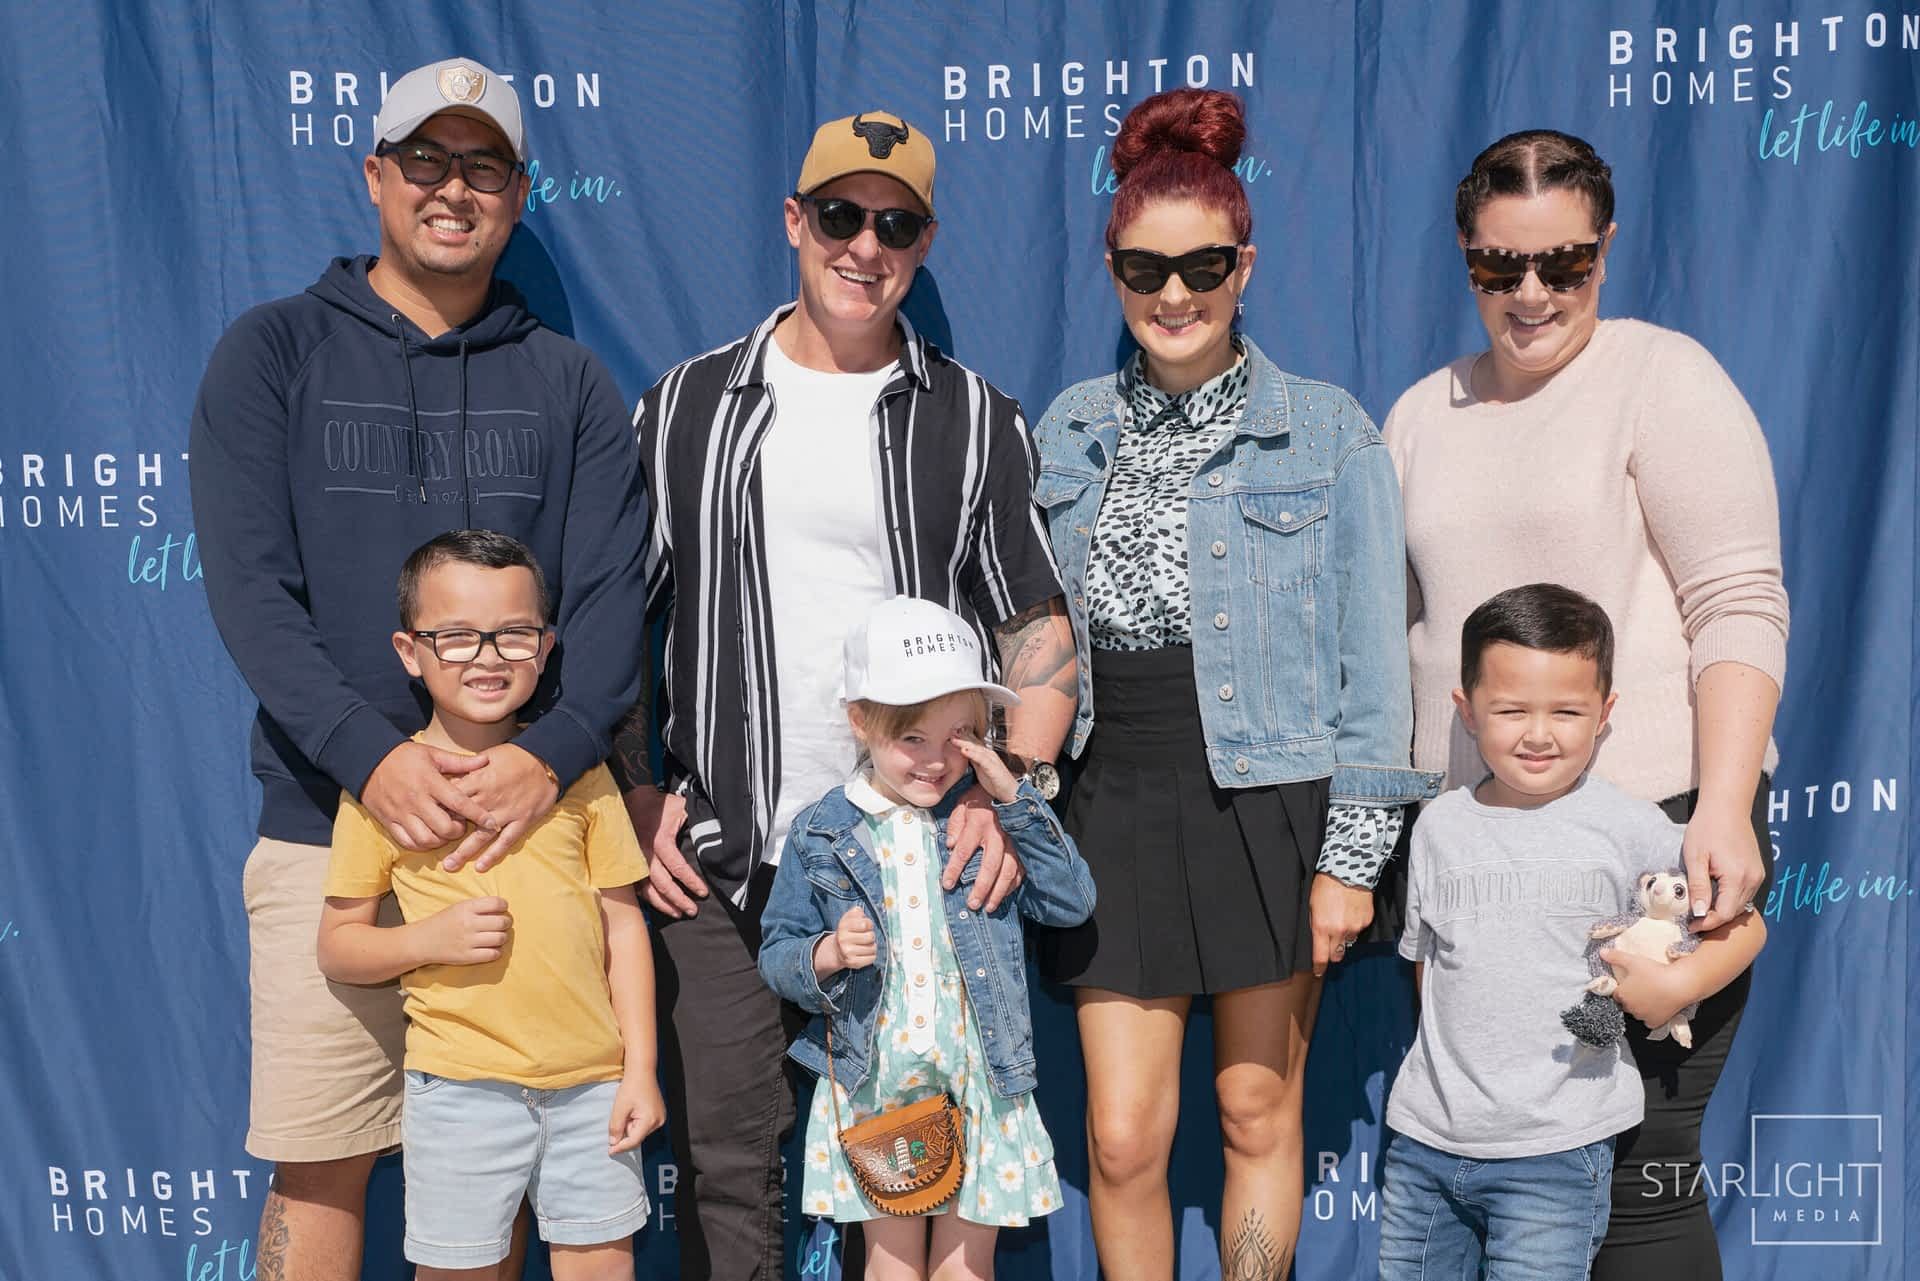 Brighton Homes - Jimmy & Tam Event